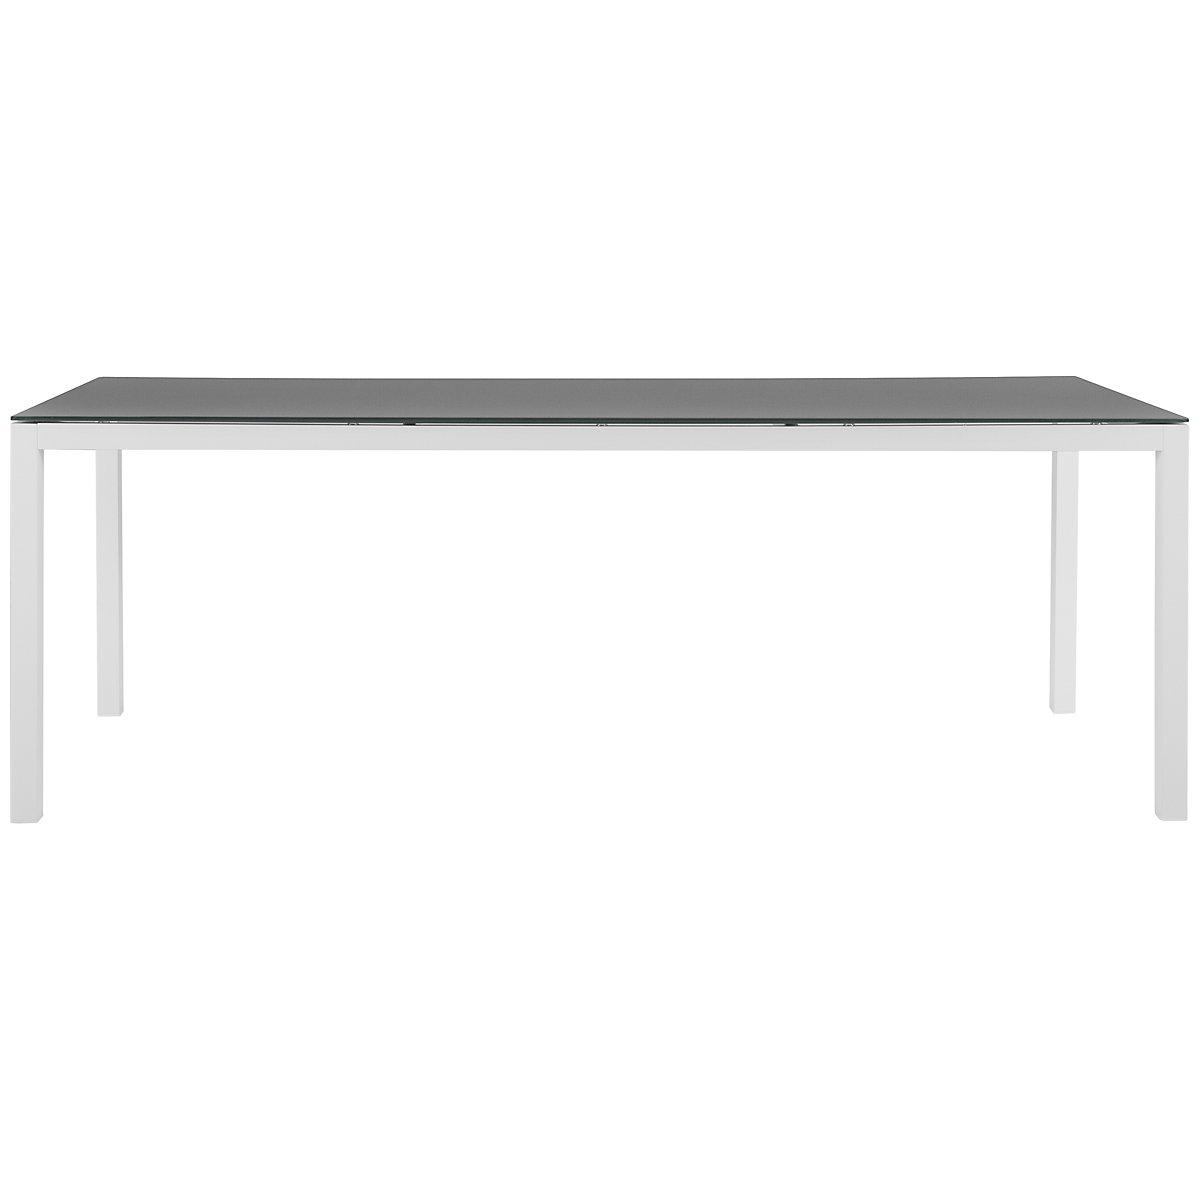 "Lisbon Gray 86"" Rectangular Table"